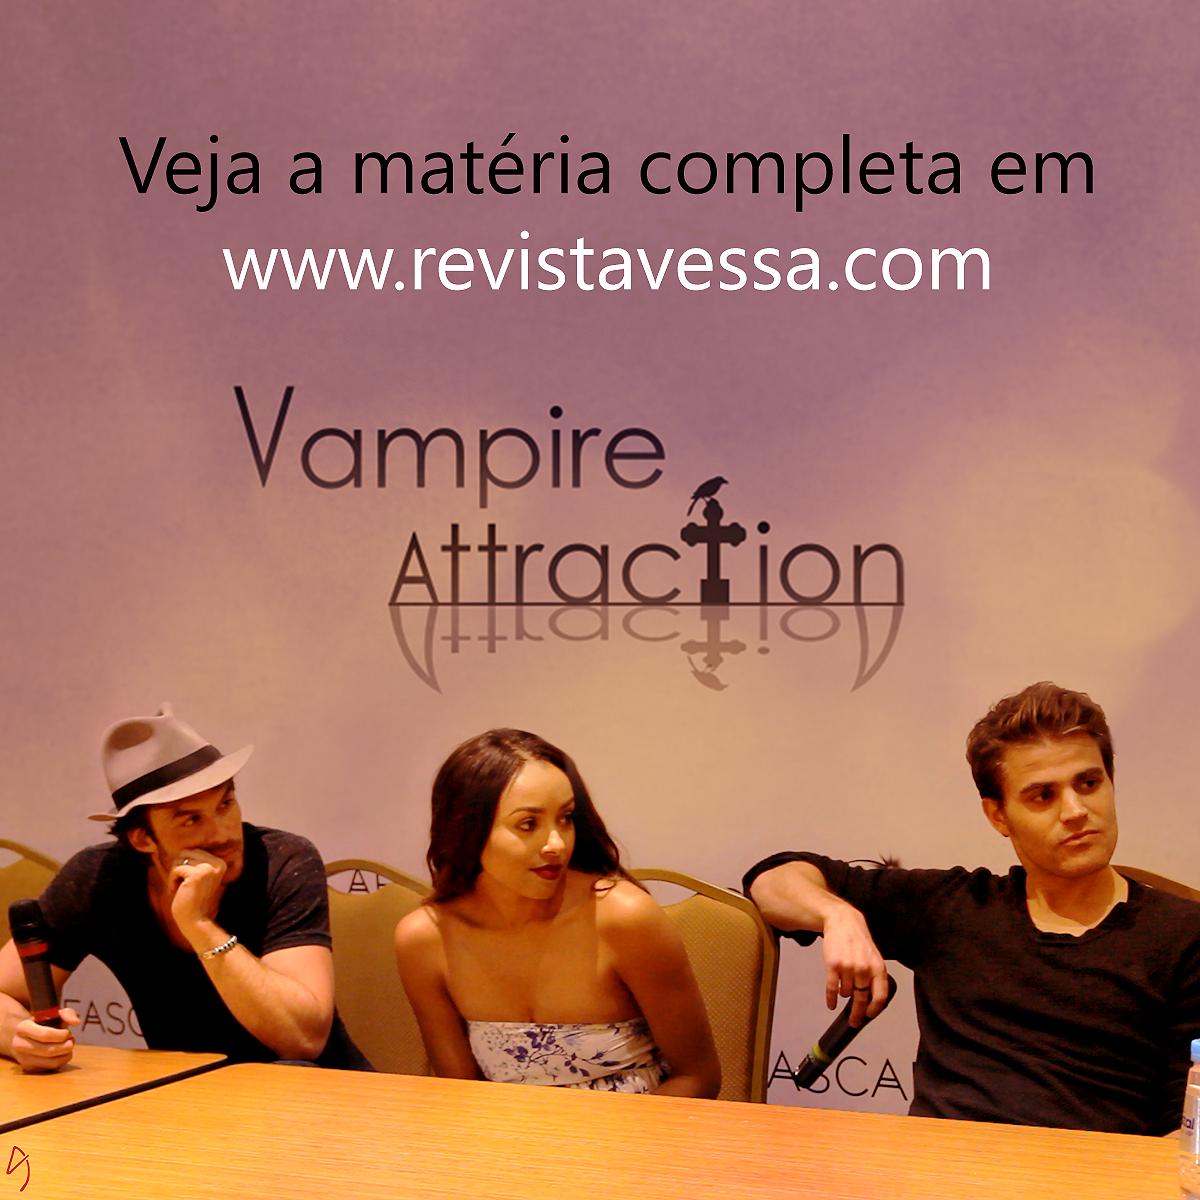 Elenco de The Vampire Diaries participa de evento no Rio de Janeiro